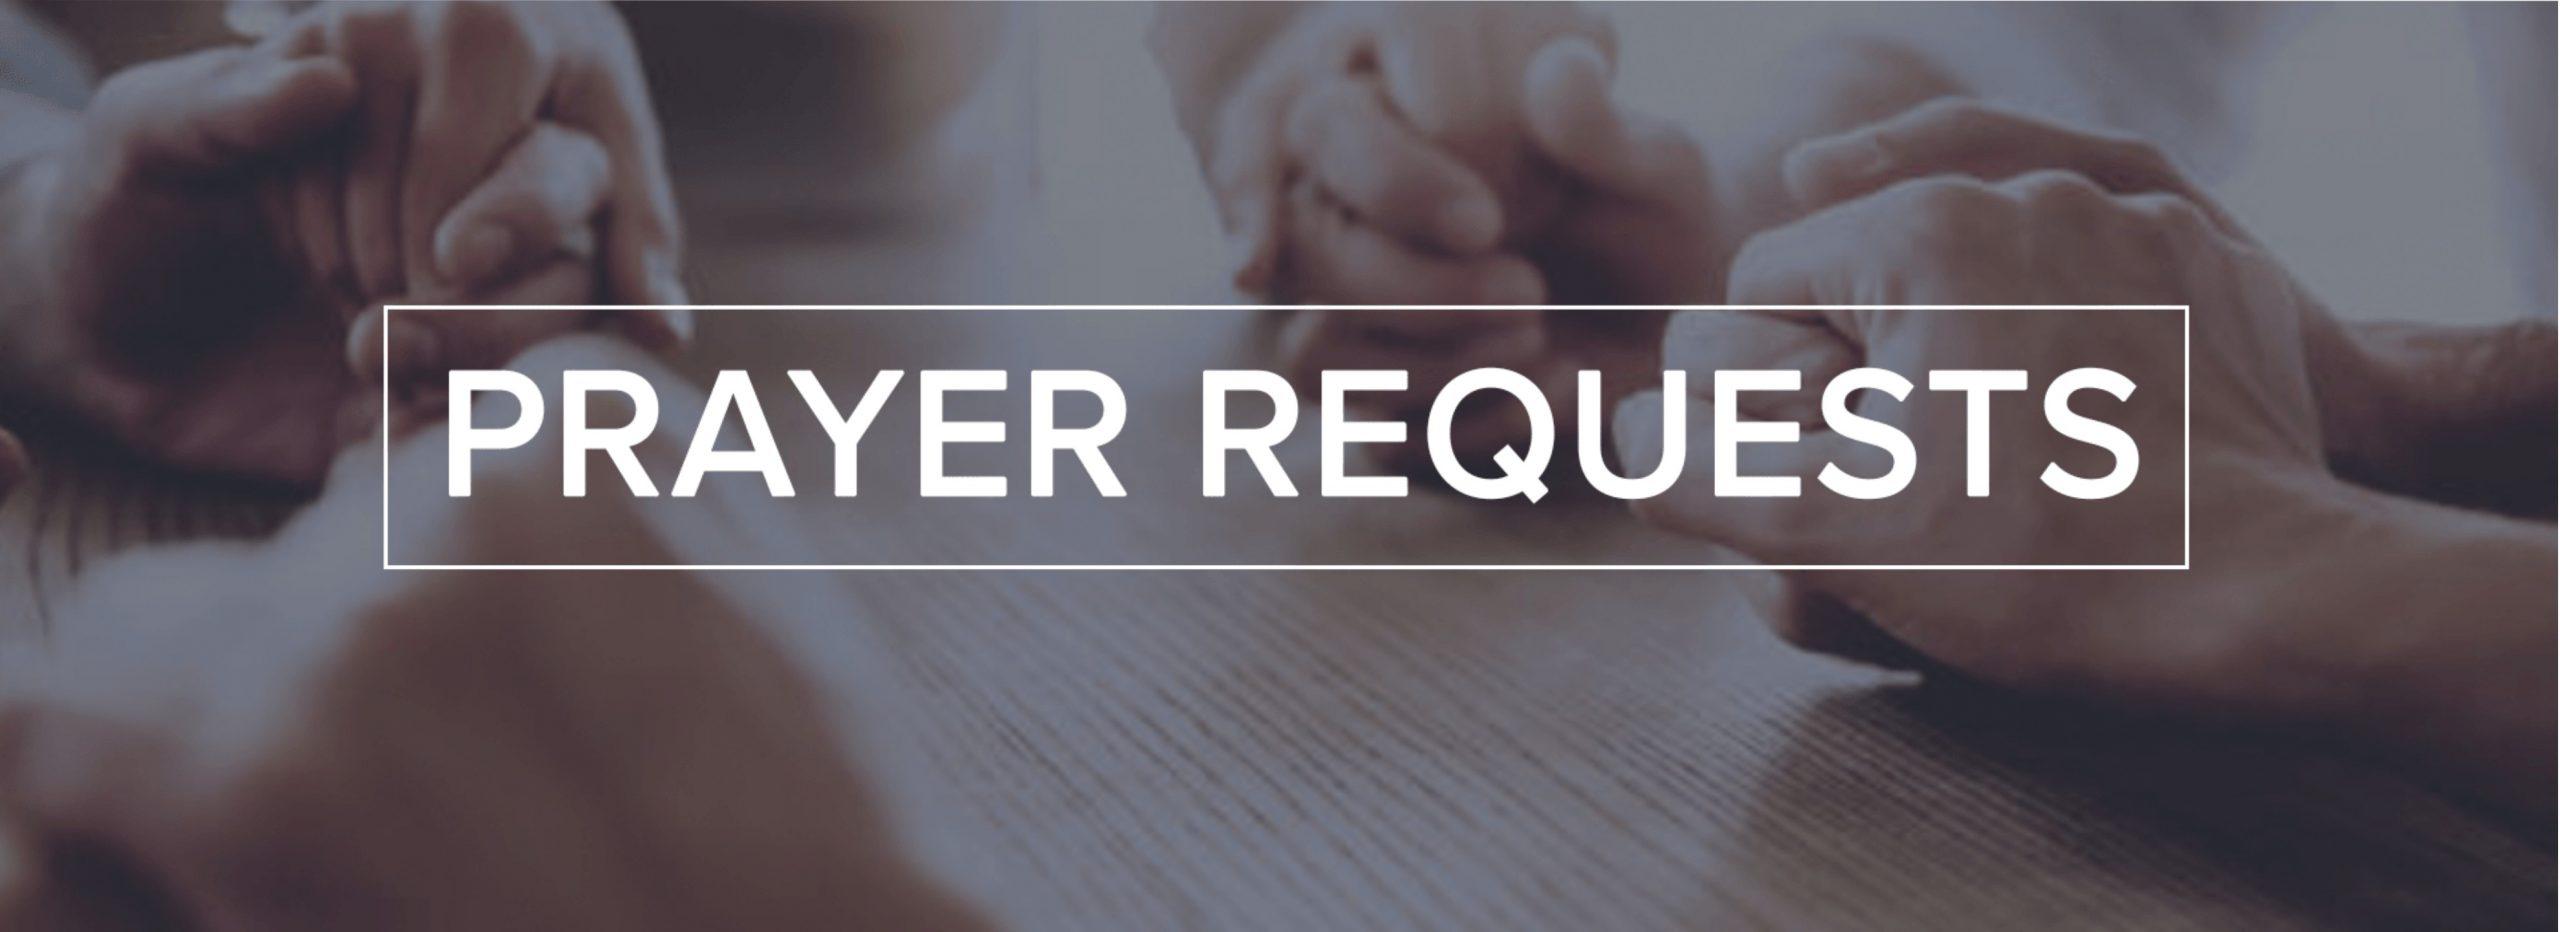 Prayer Request 1